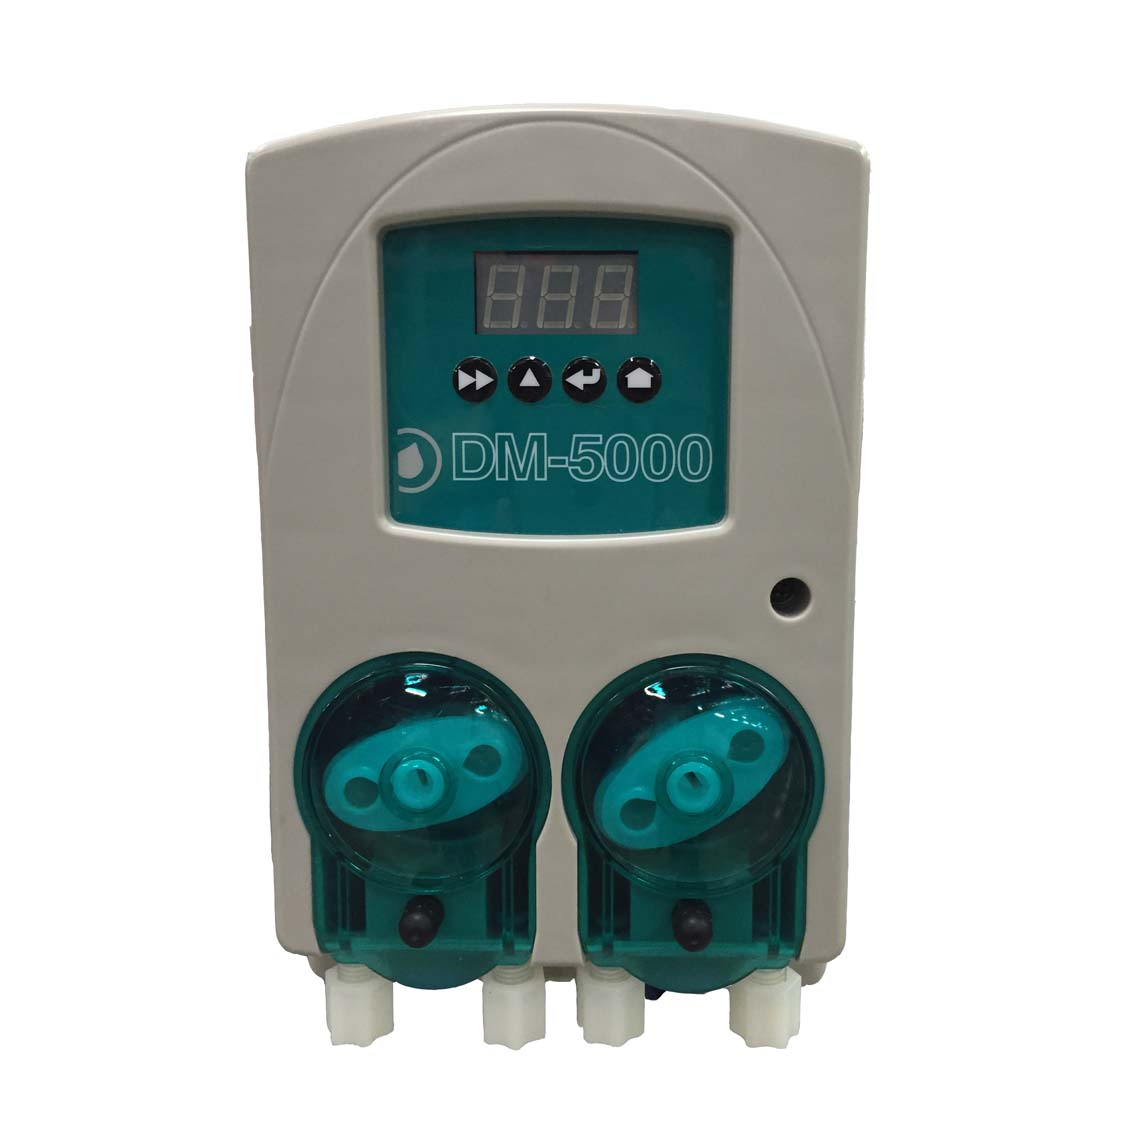 dm-5000-30x30